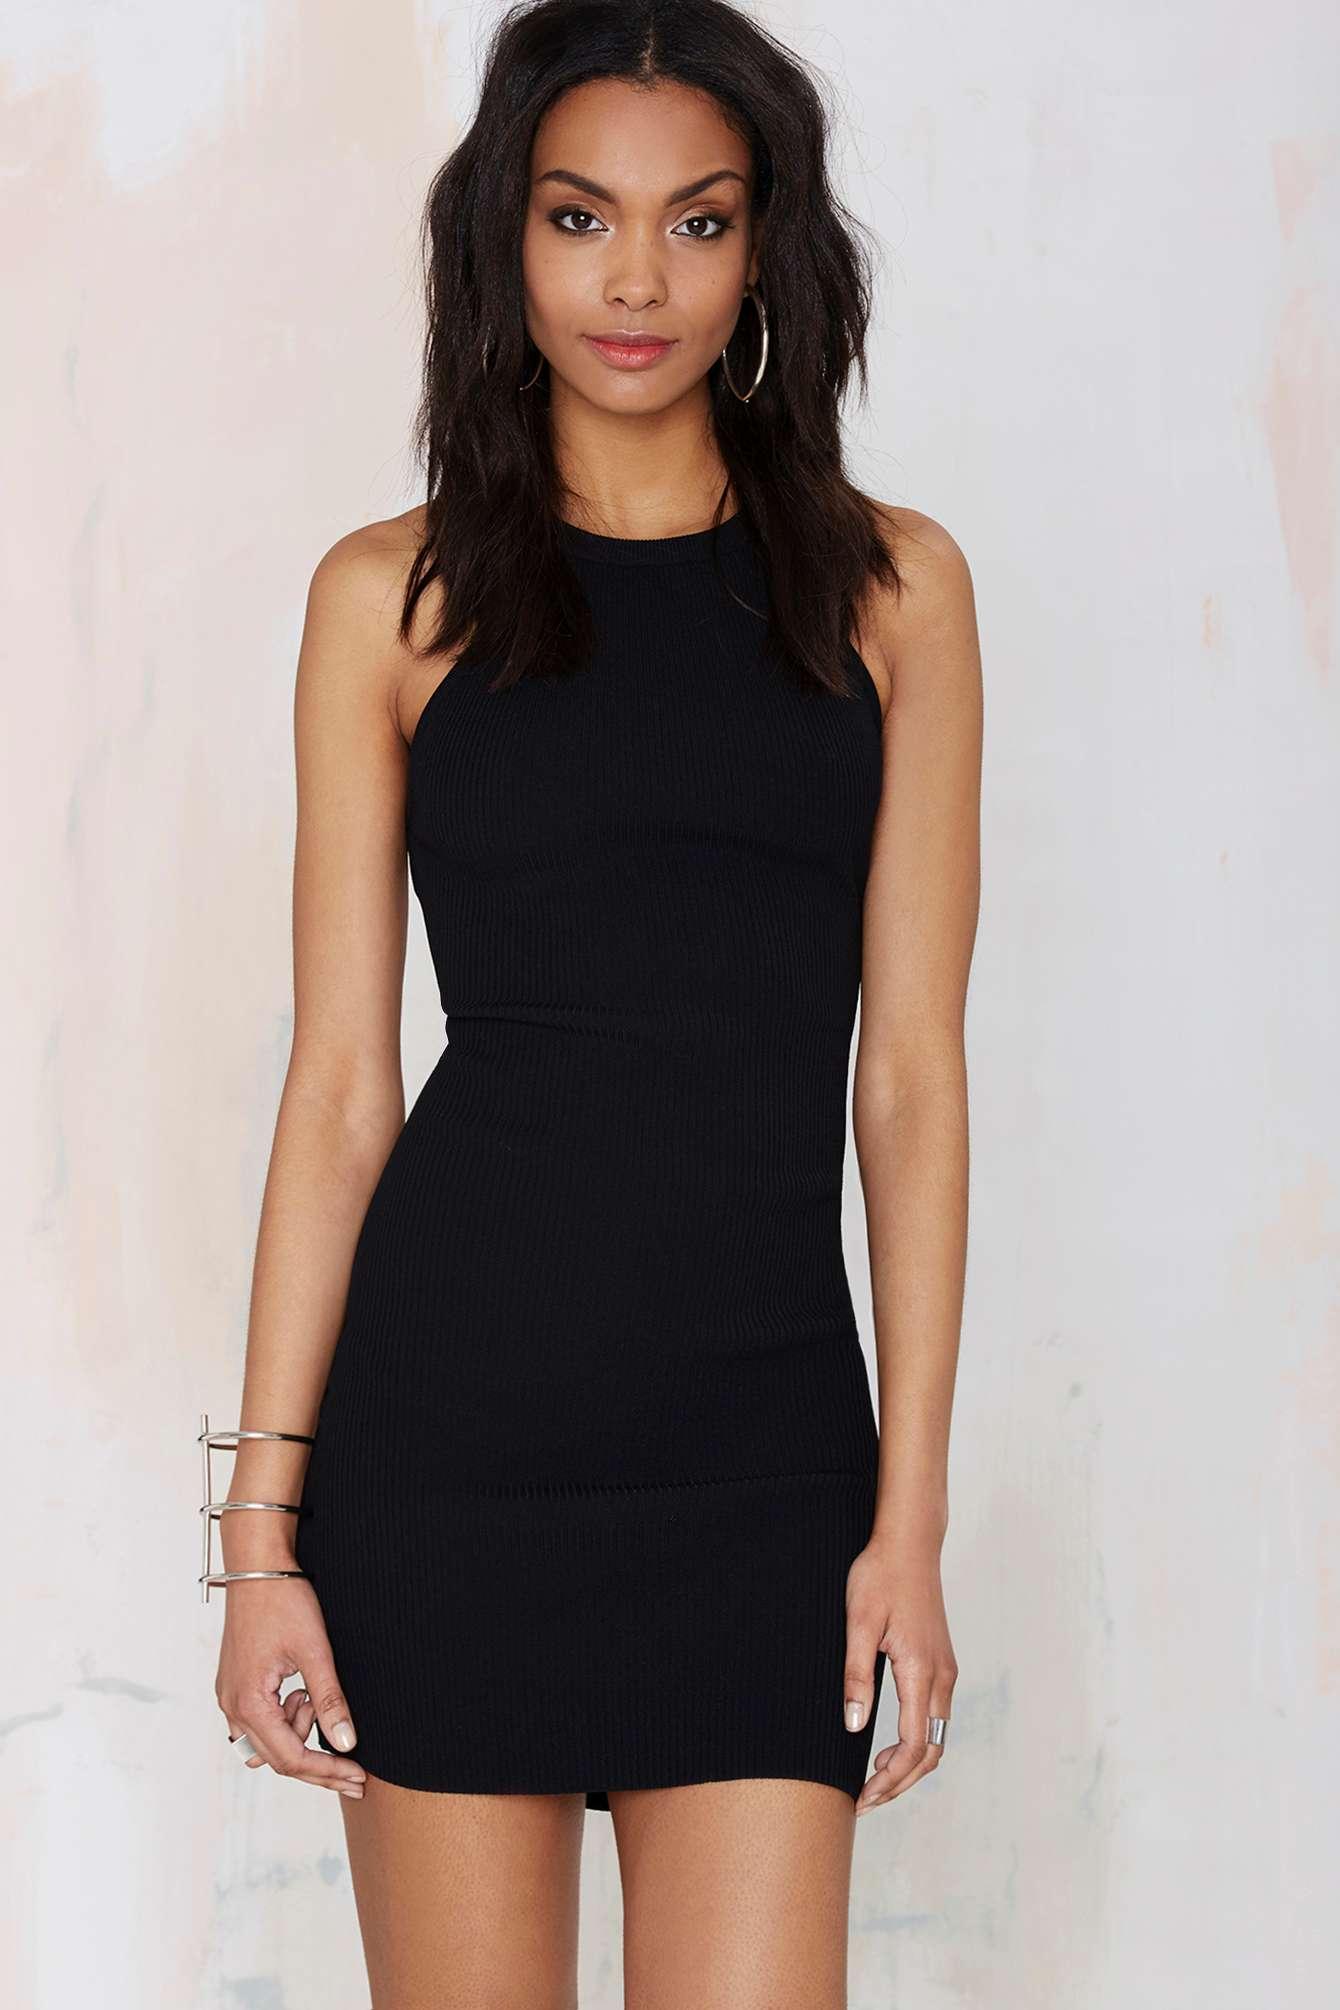 Lyst - Nasty Gal Hold Tight Cutaway Dress in Black